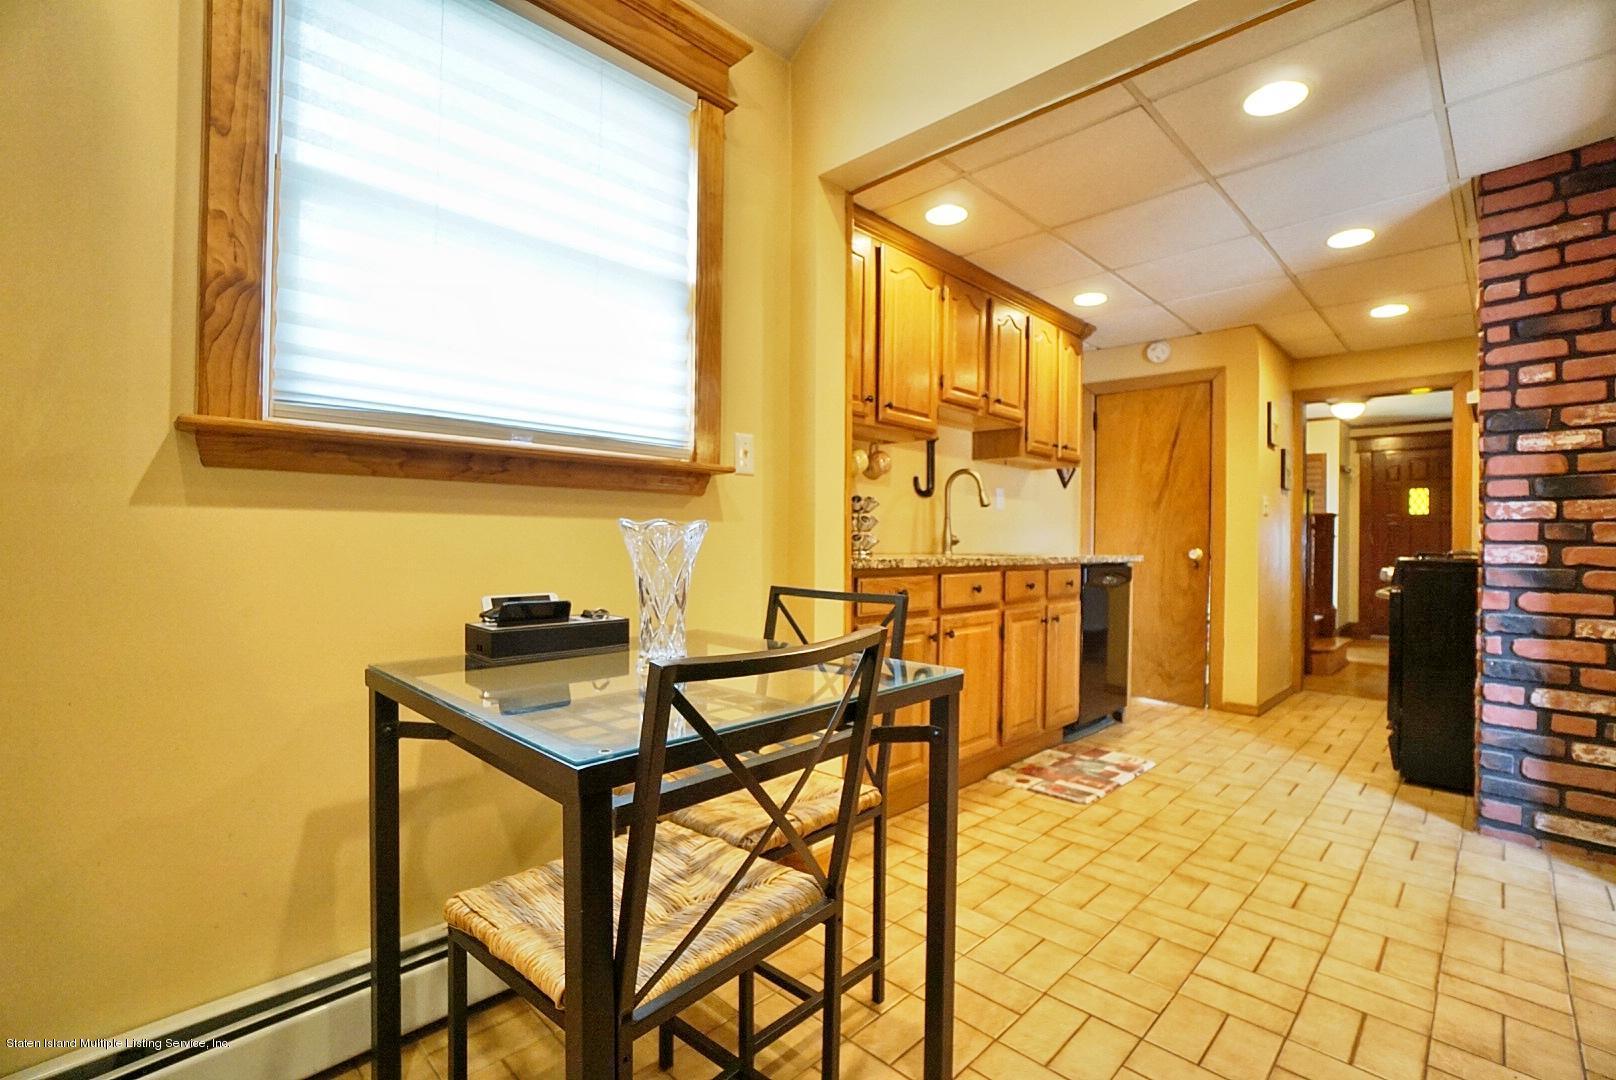 Single Family - Detached 22 Maine Avenue  Staten Island, NY 10314, MLS-1128323-4